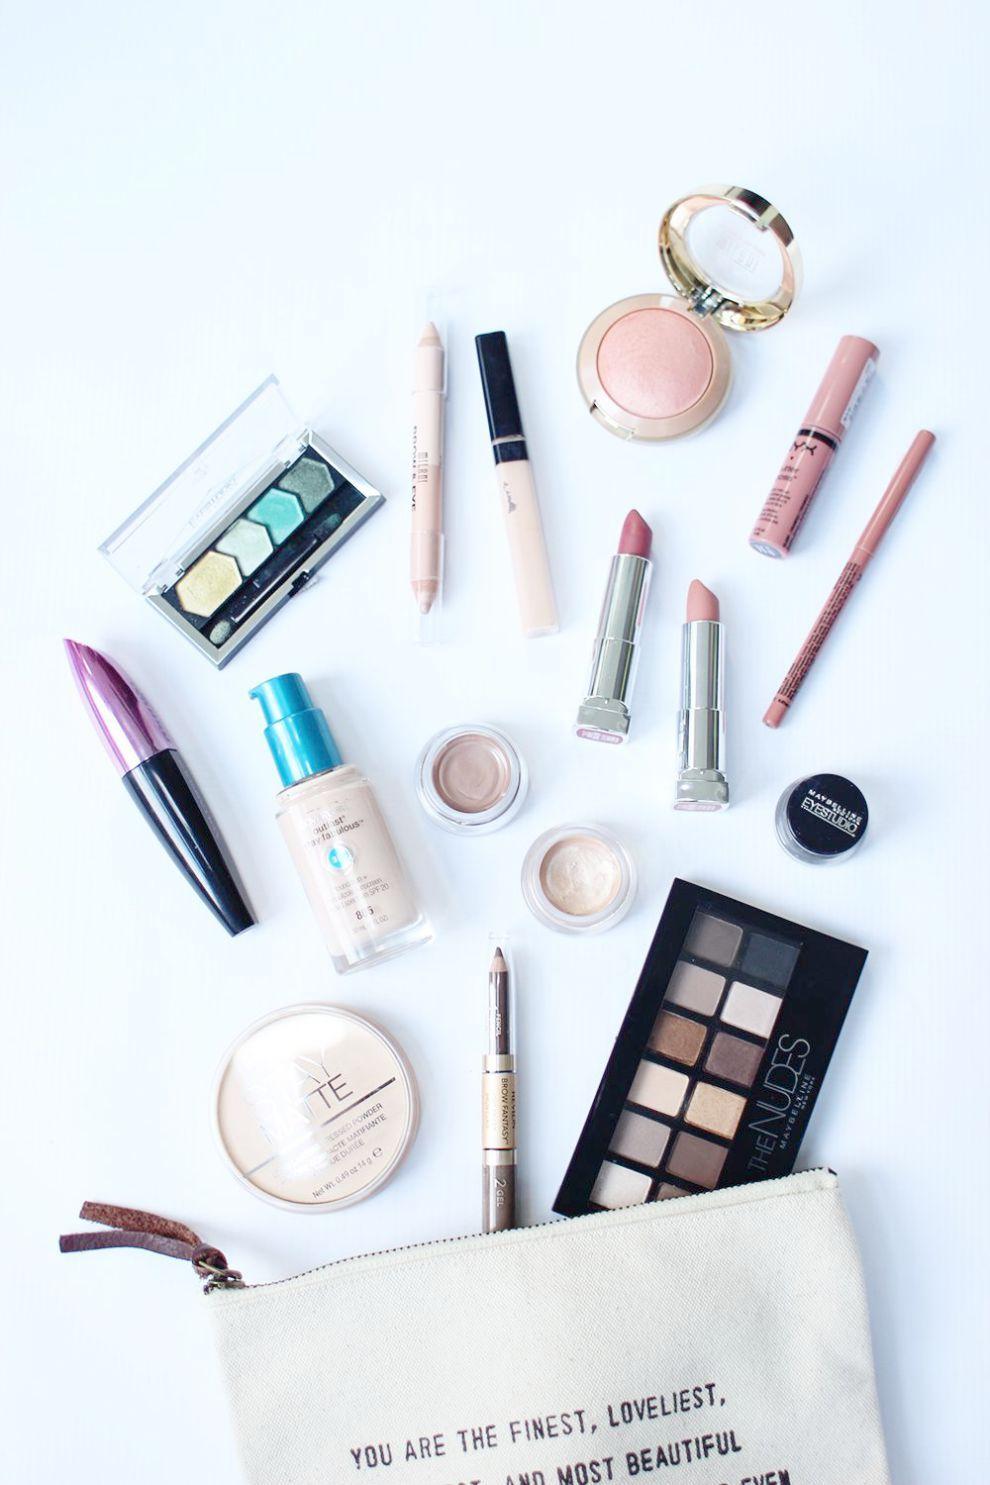 Makeup Artist Average Salary but Sophia Joy Makeup Bag